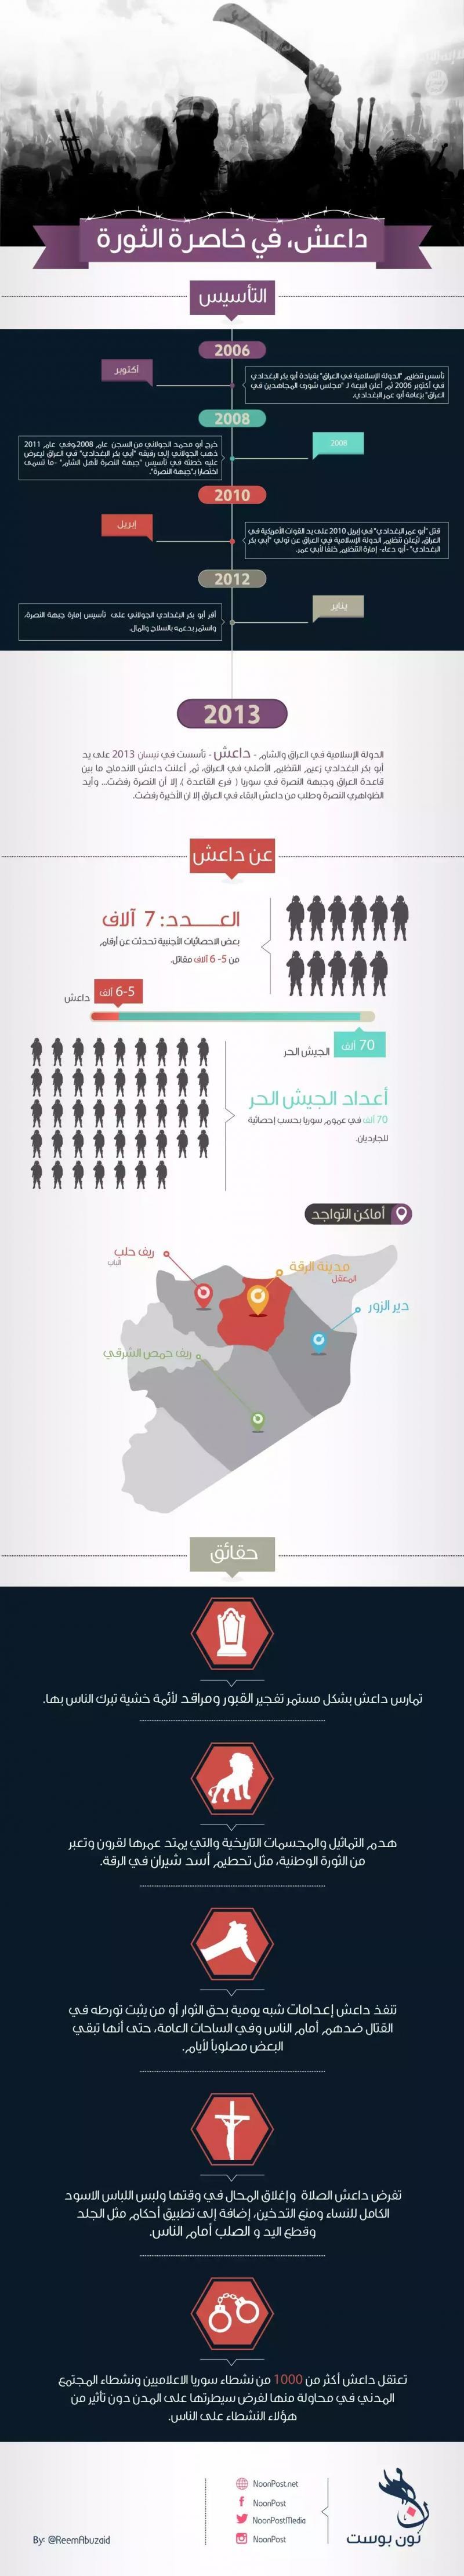 #داعش في #سوريا #انفوجرافيك